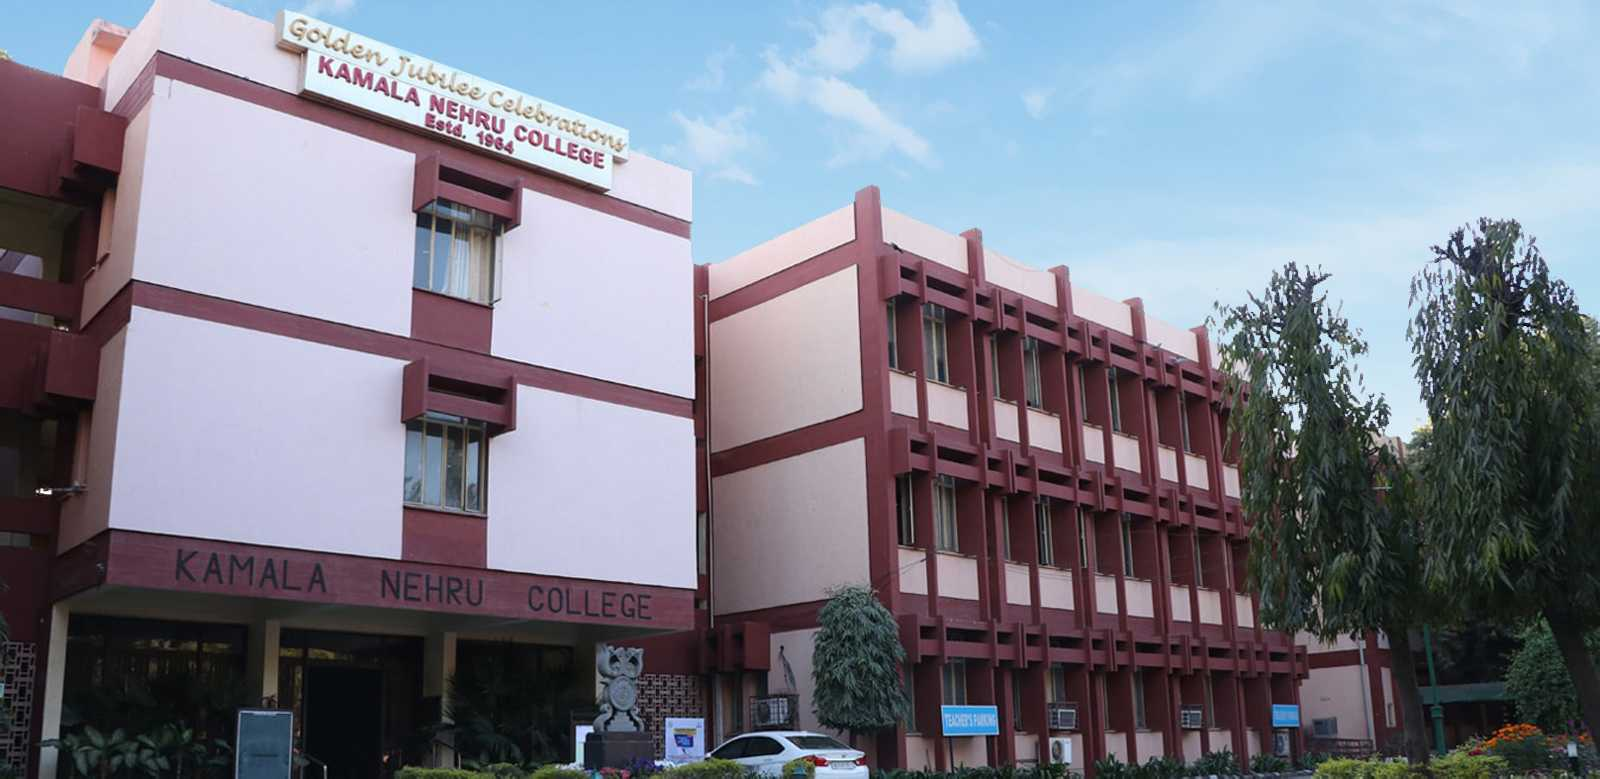 Kamala Nehru College, New Delhi Image